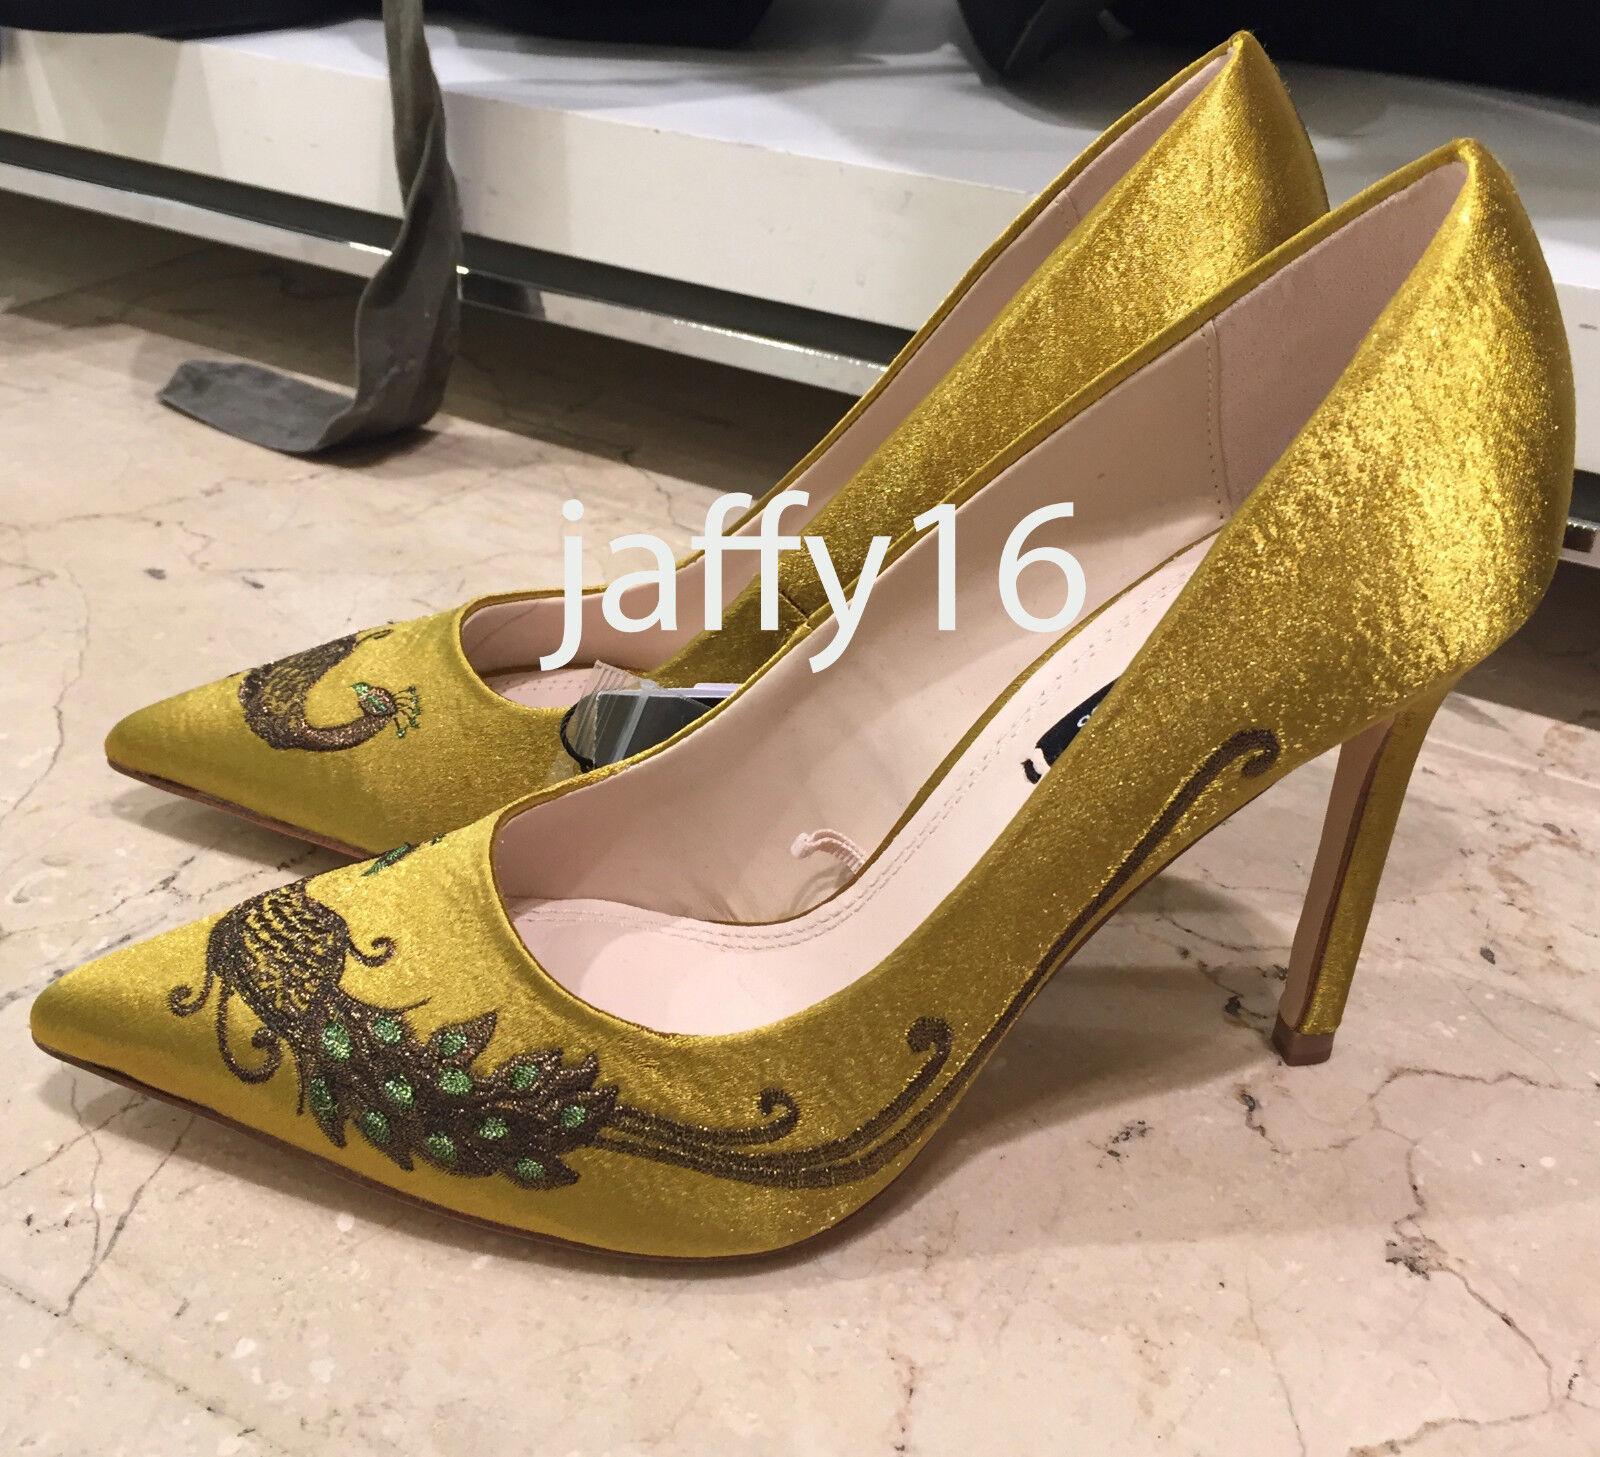 ZARA SATIN COURT Schuhe WITH EMBROIDEROT BEADING YELLOW 35-42 REF. 6216/201